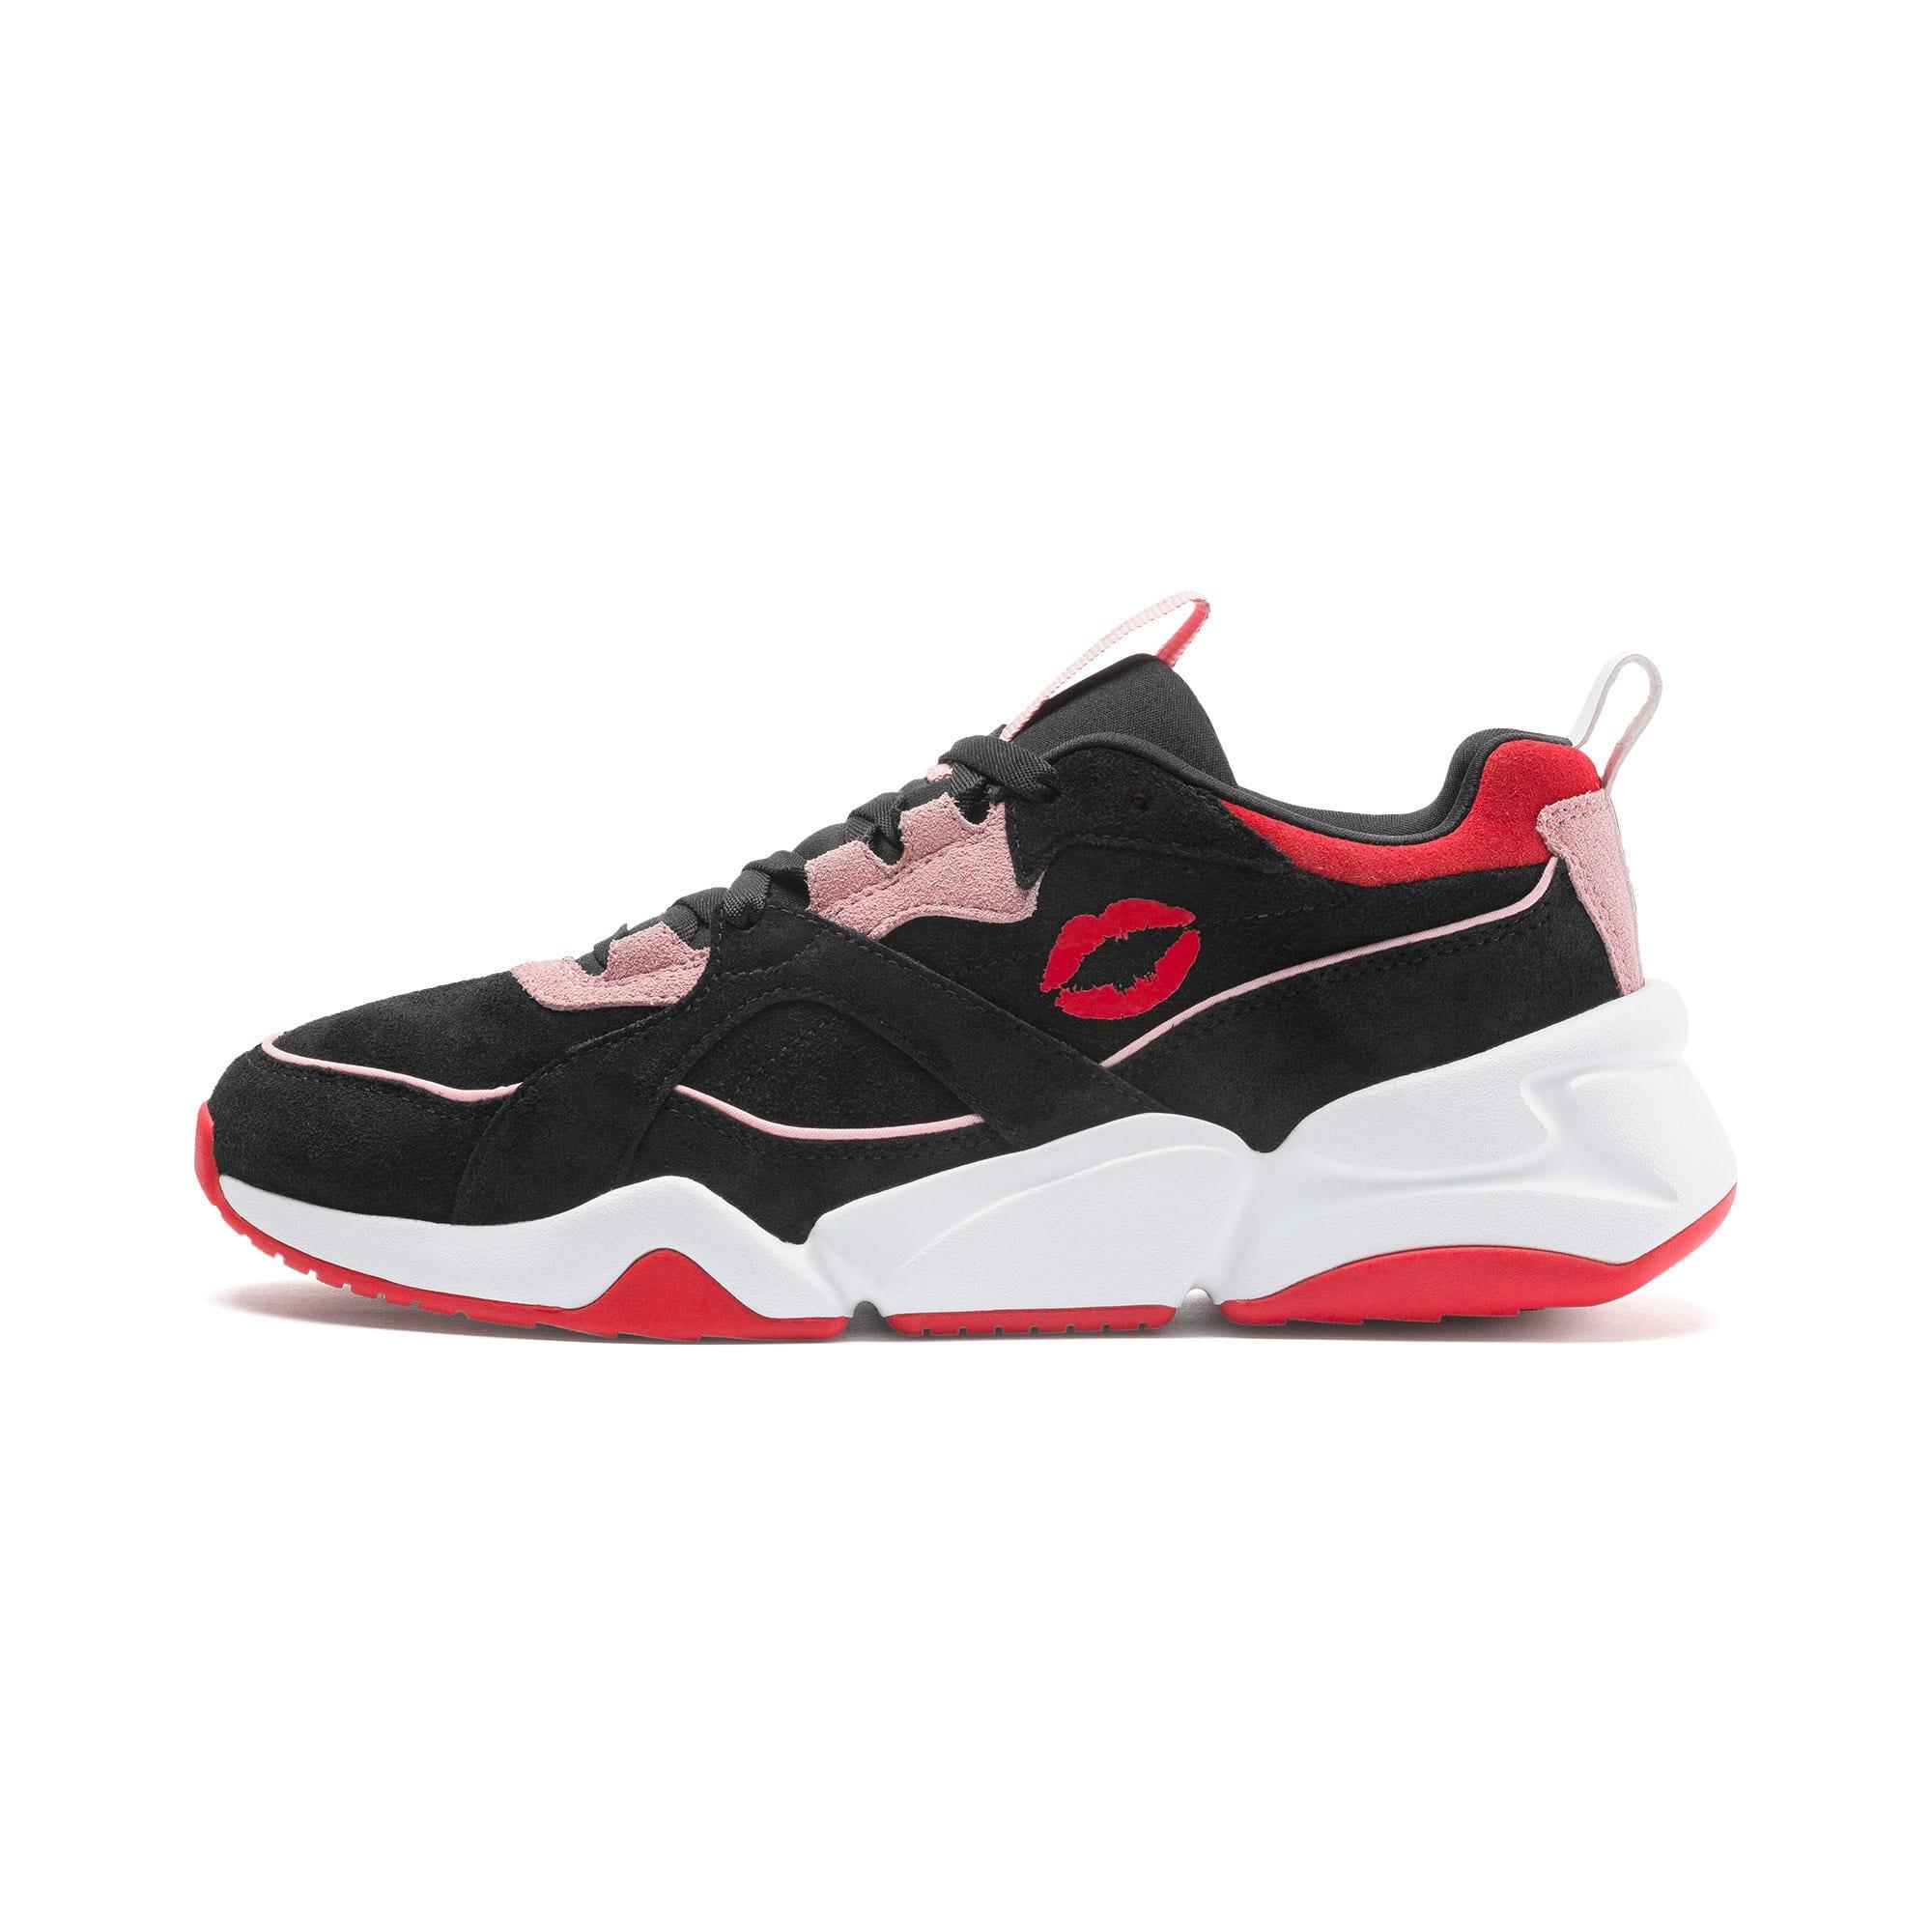 Women's Sneakers   GUCCI®